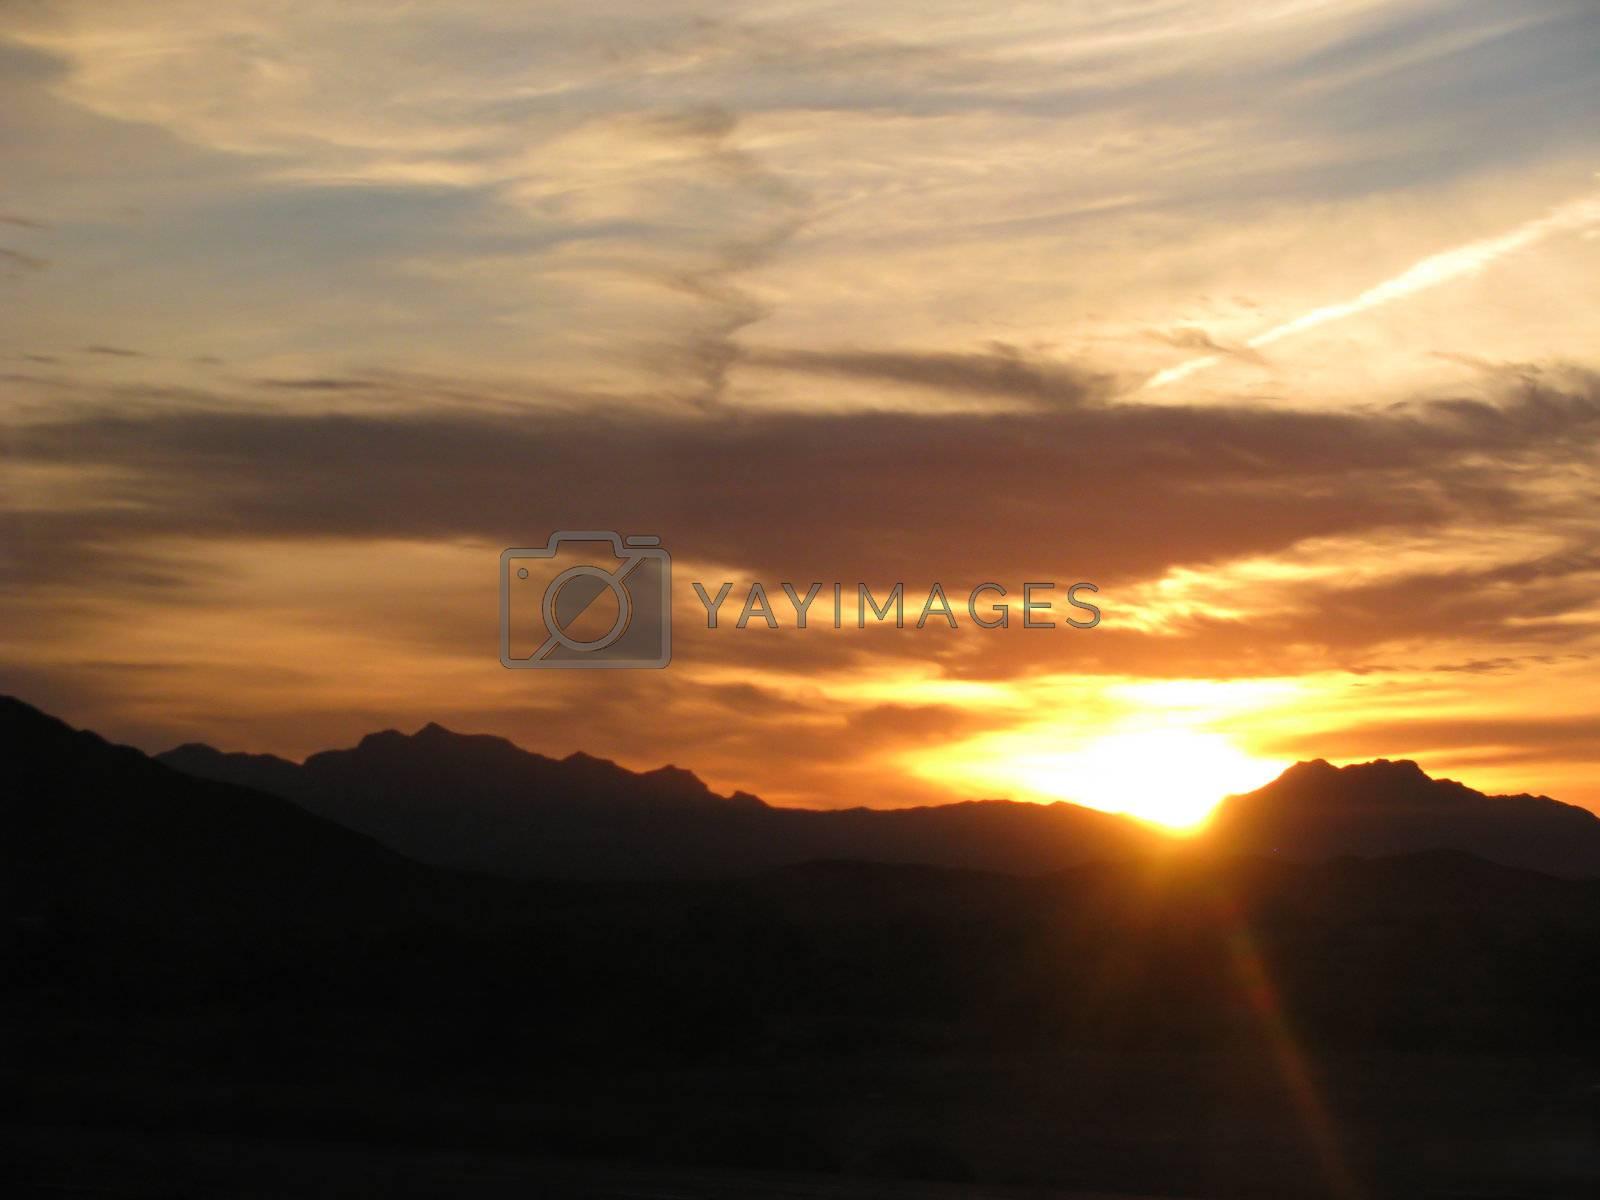 Royalty free image of Arizona Desert Sunset v1 by mwp1969